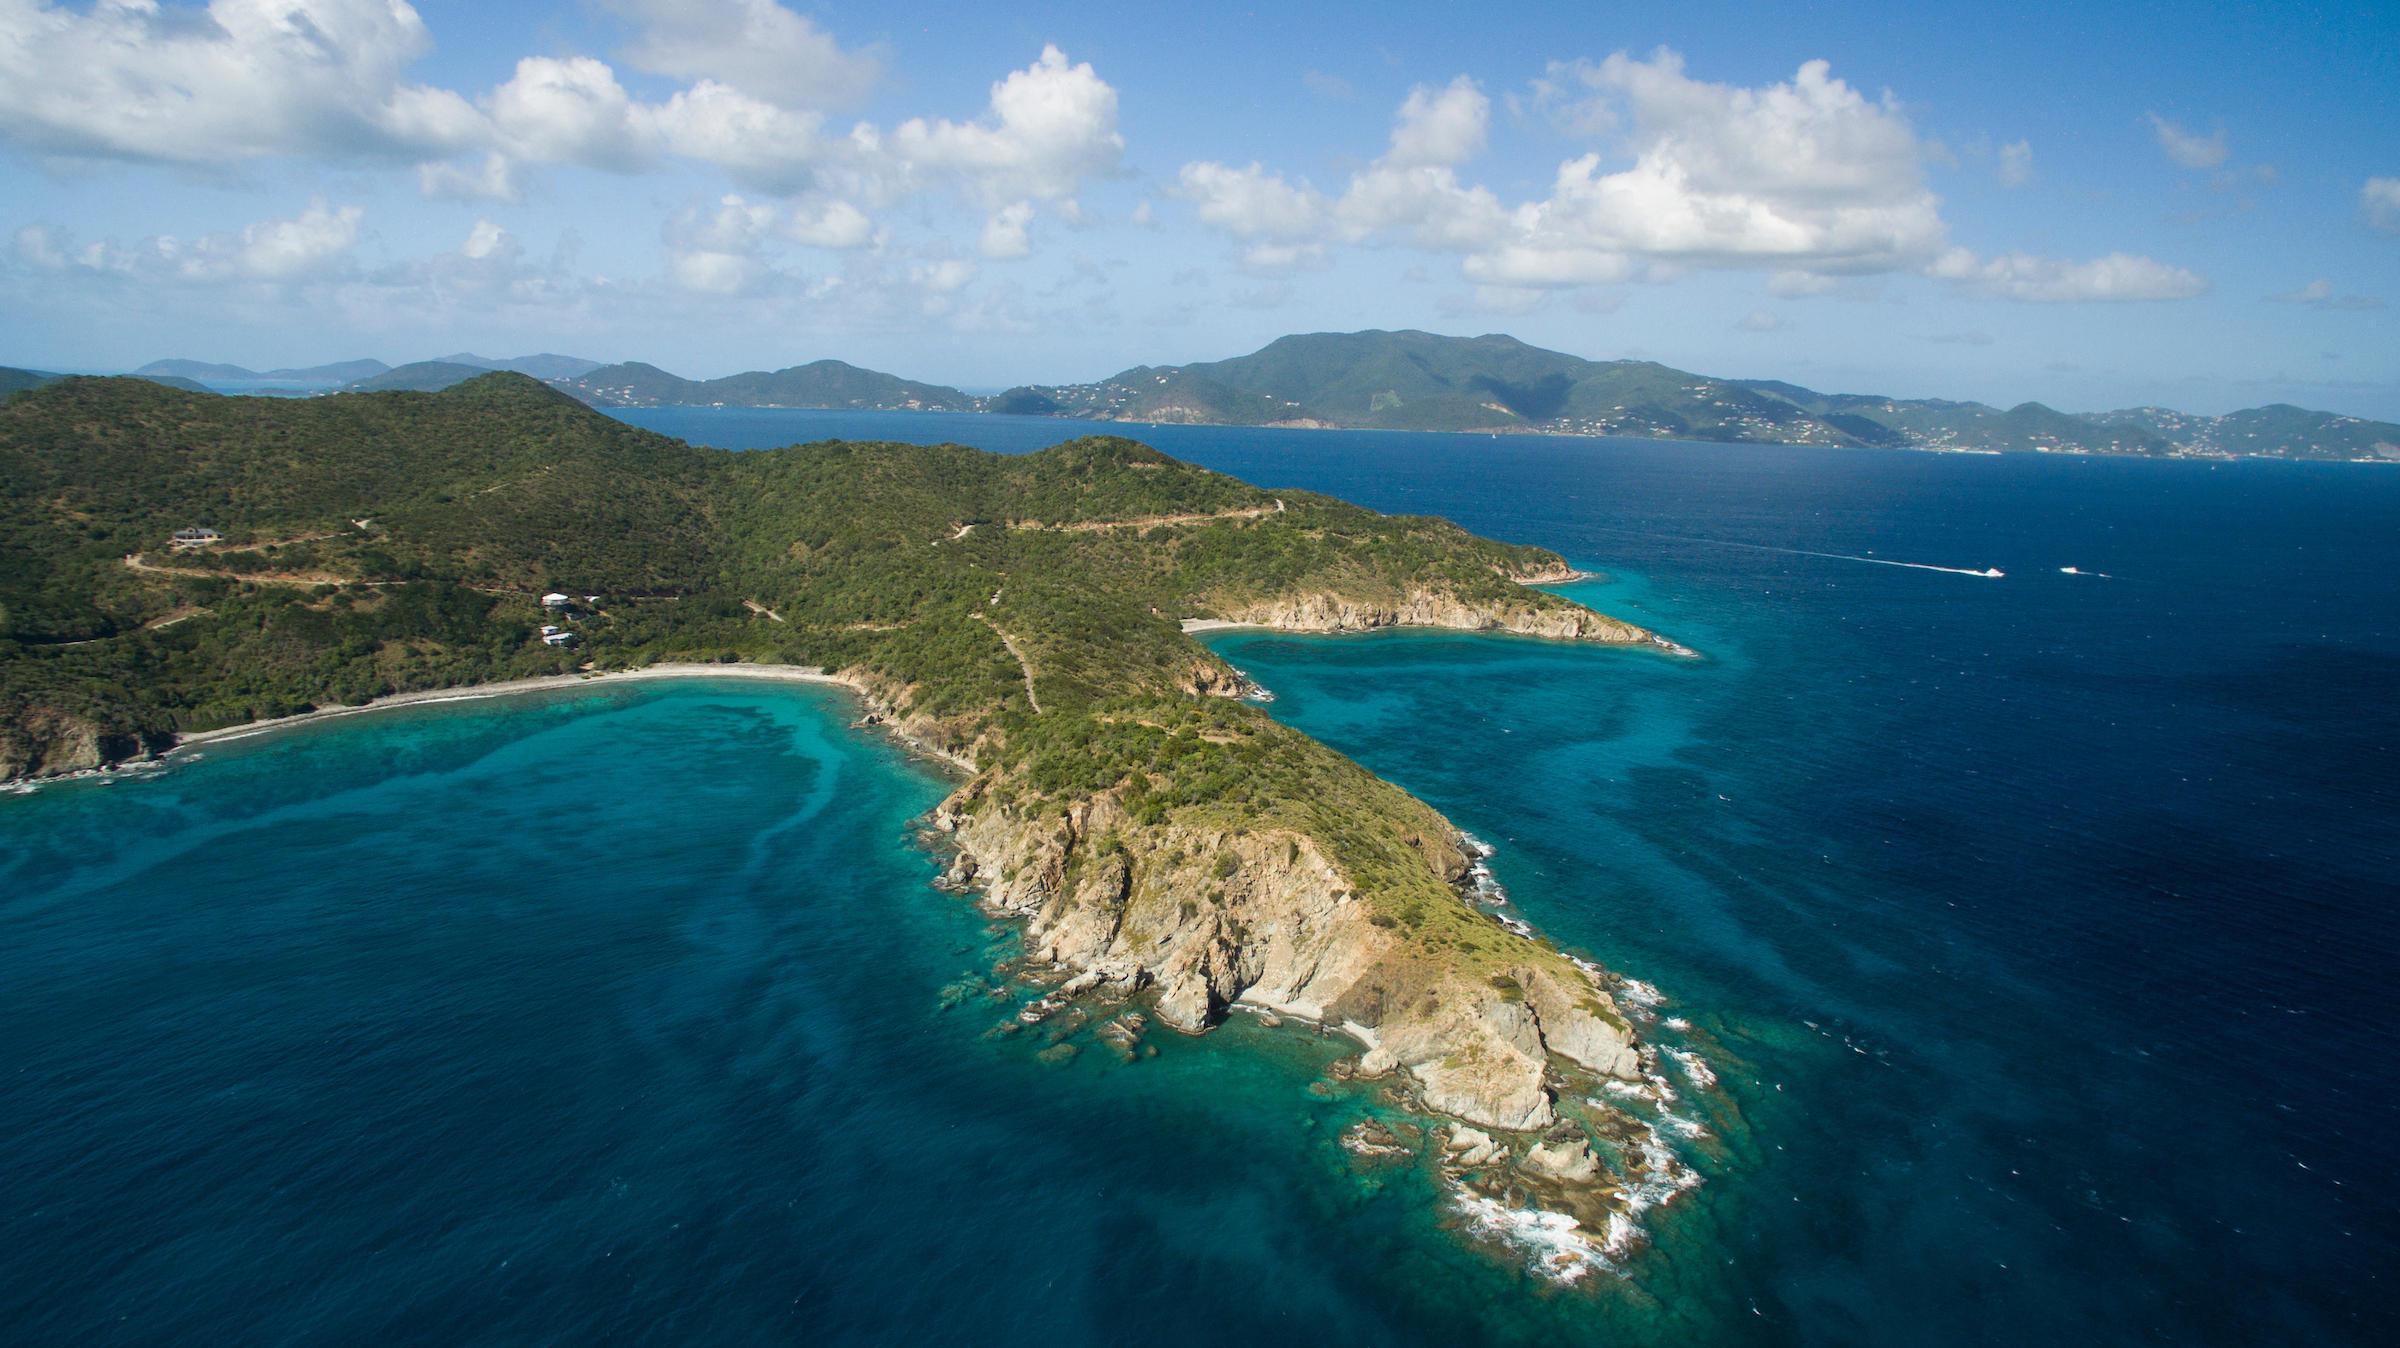 St John, Virgin Islands 00830, ,Land,For Sale,17-287